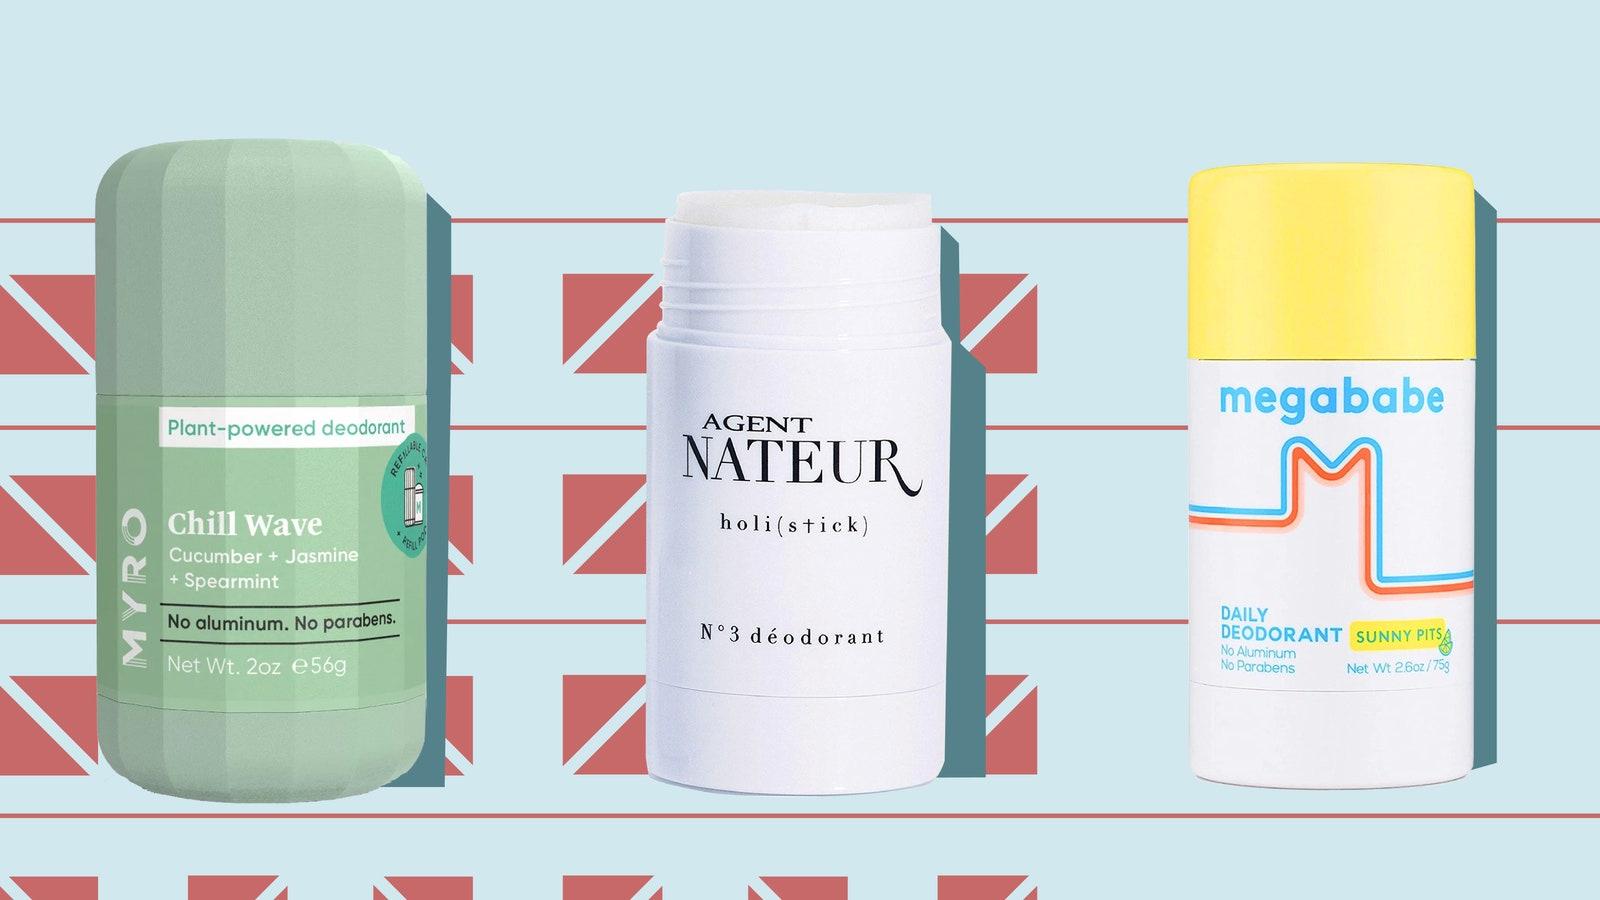 10 Best Natural Deodorants - Organic Brands